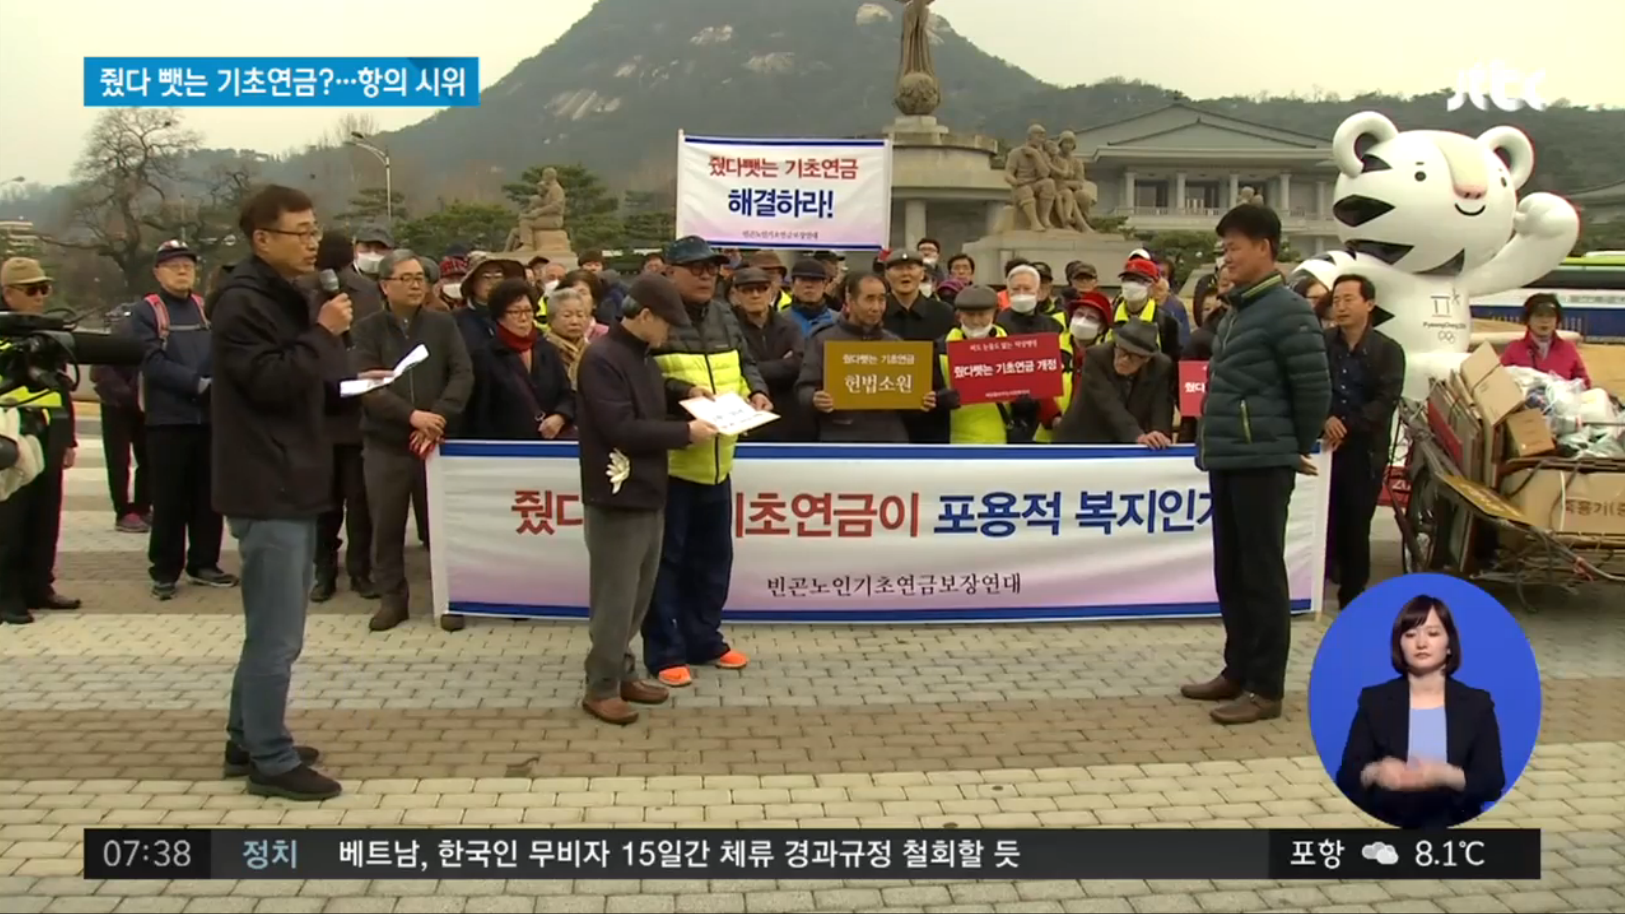 [19.3.25 JTBC] 줬다 뺏는 기초연금 해결하라…손수레 끌고 항의 시위2.png